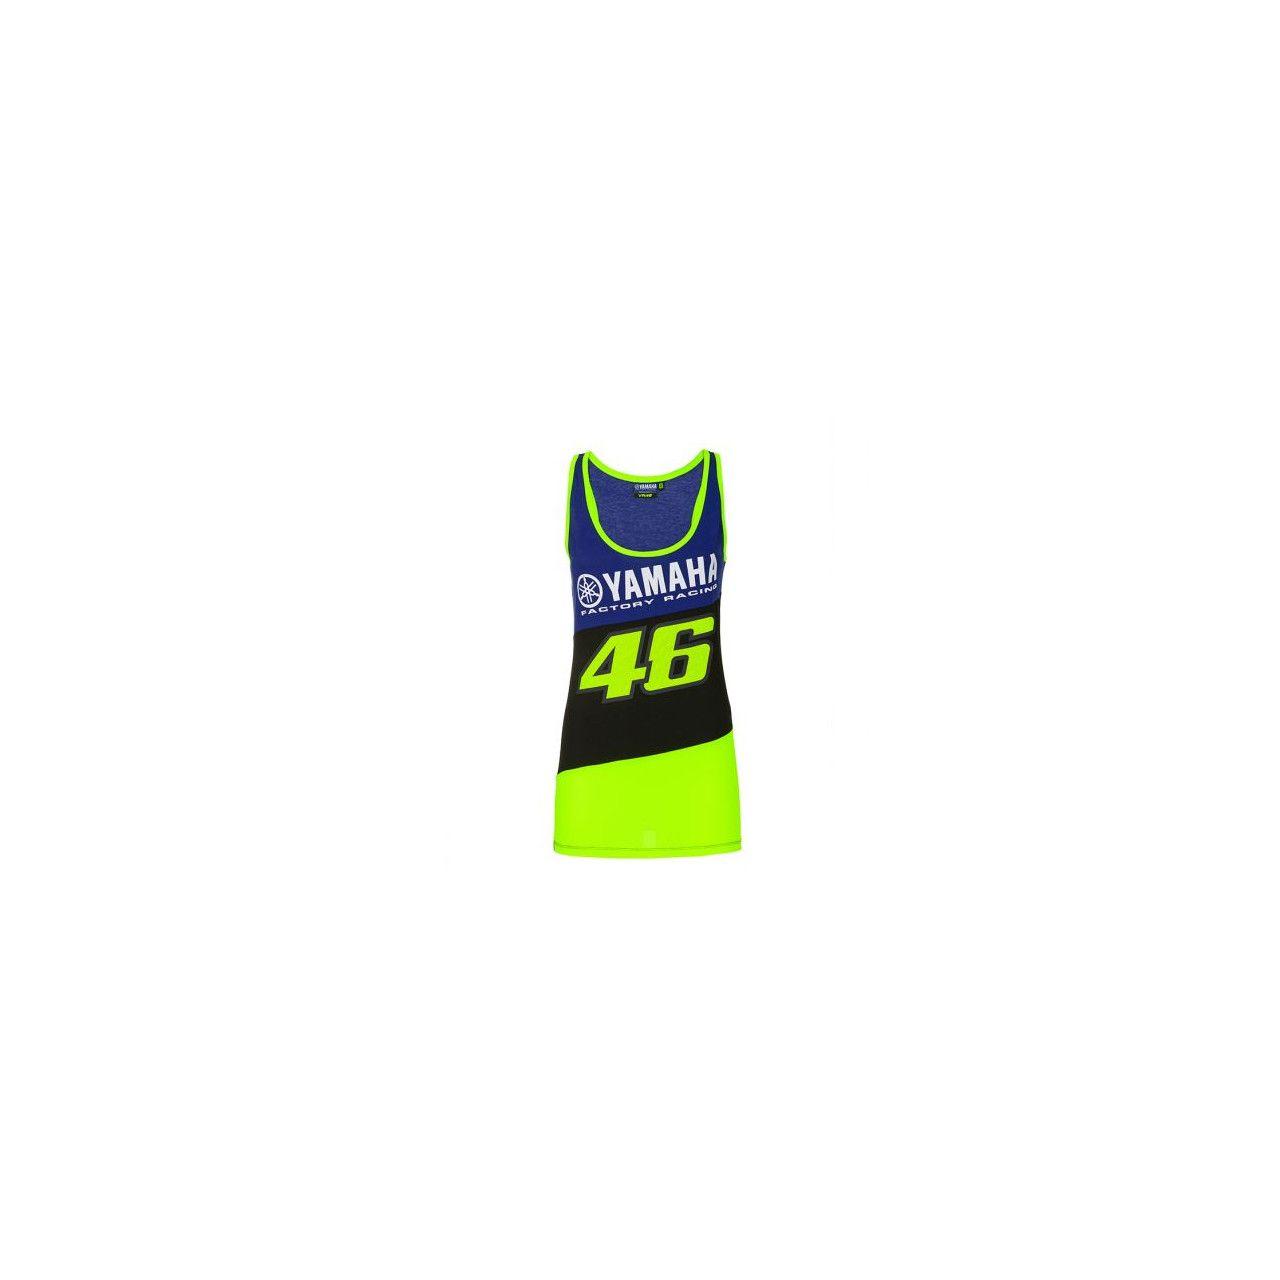 YAMAHA Débardeur femme Racing VR46 2020